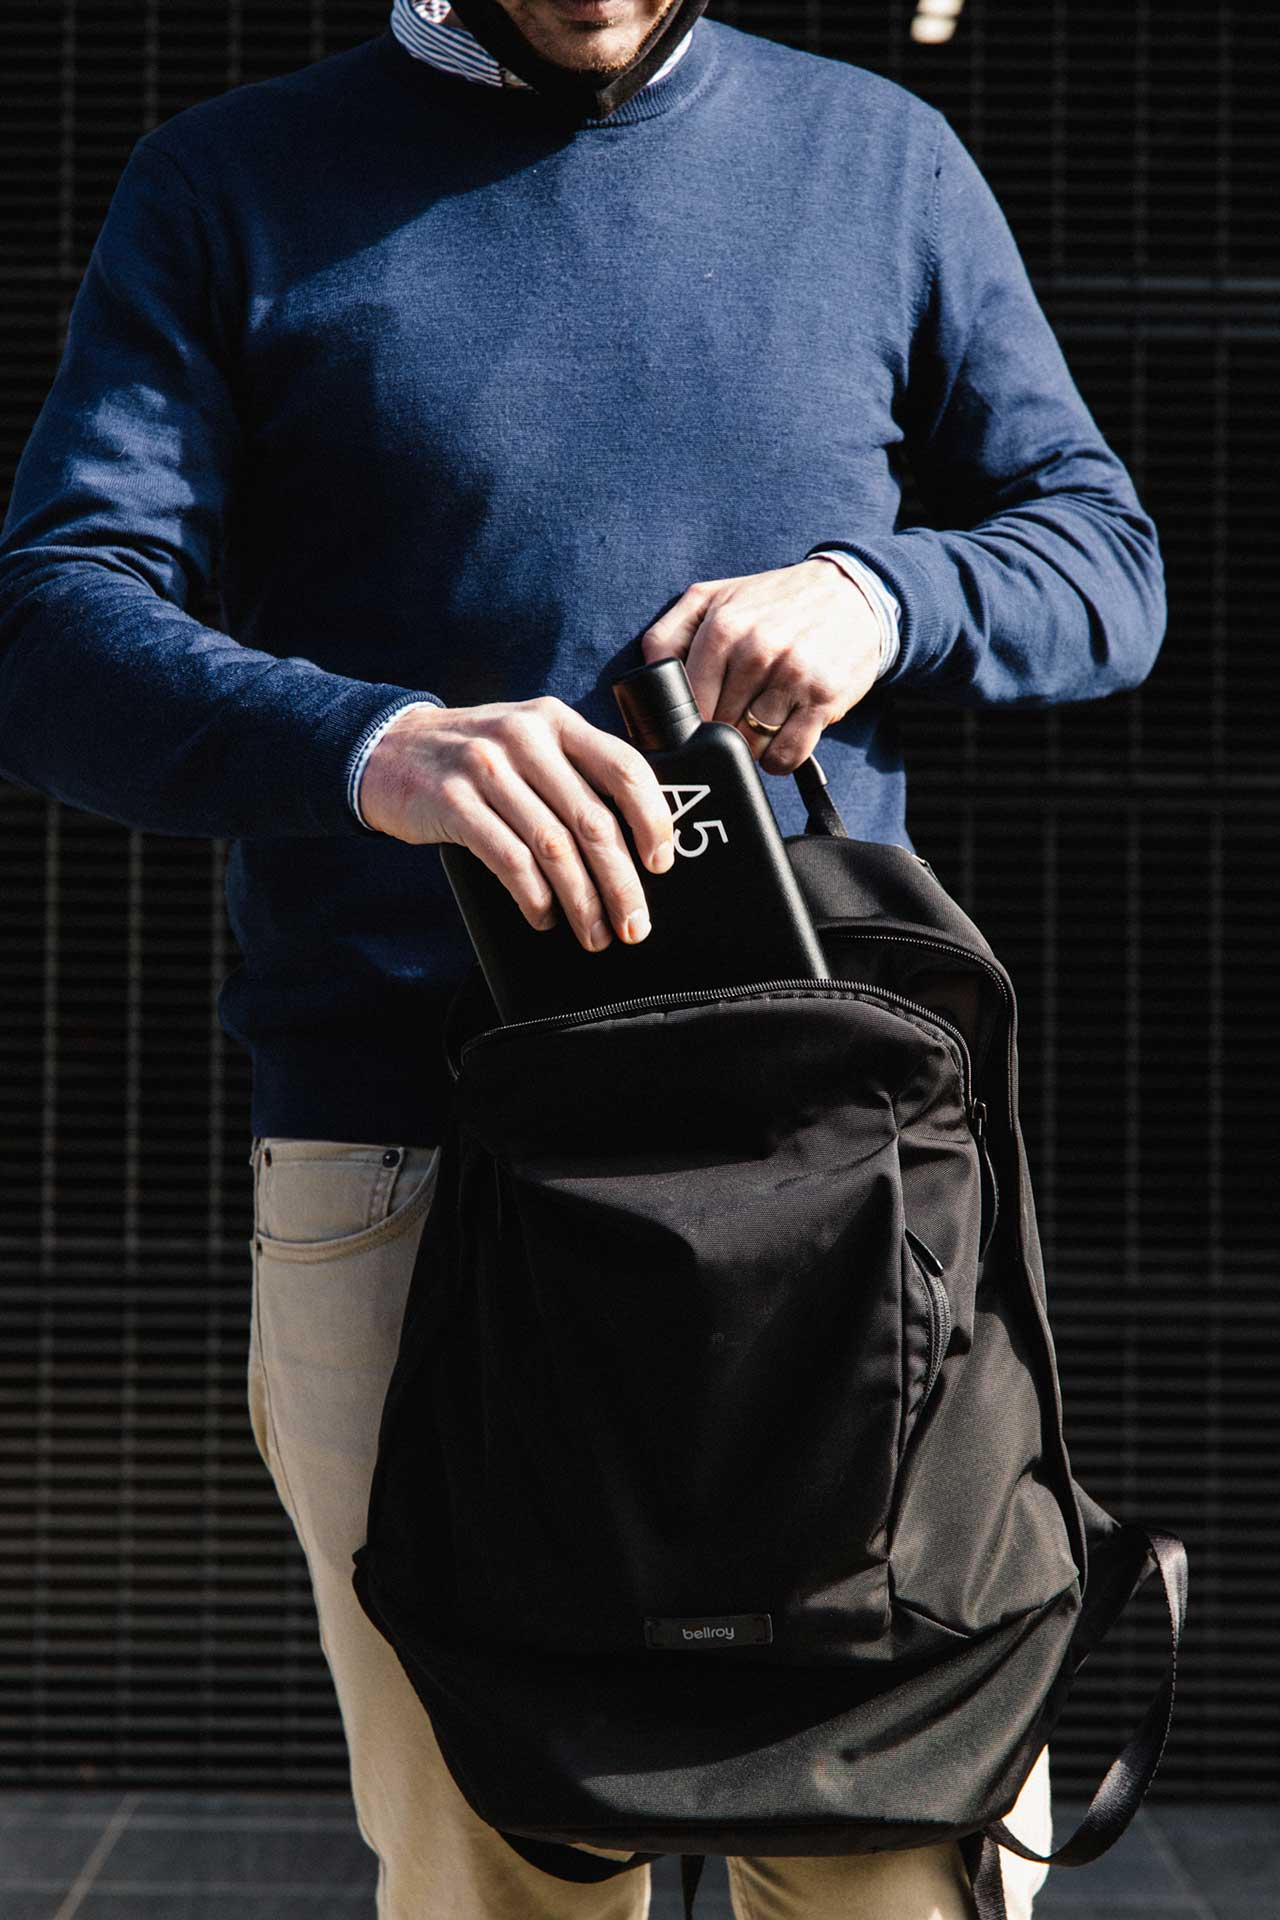 man placing flat black water bottle in backpack